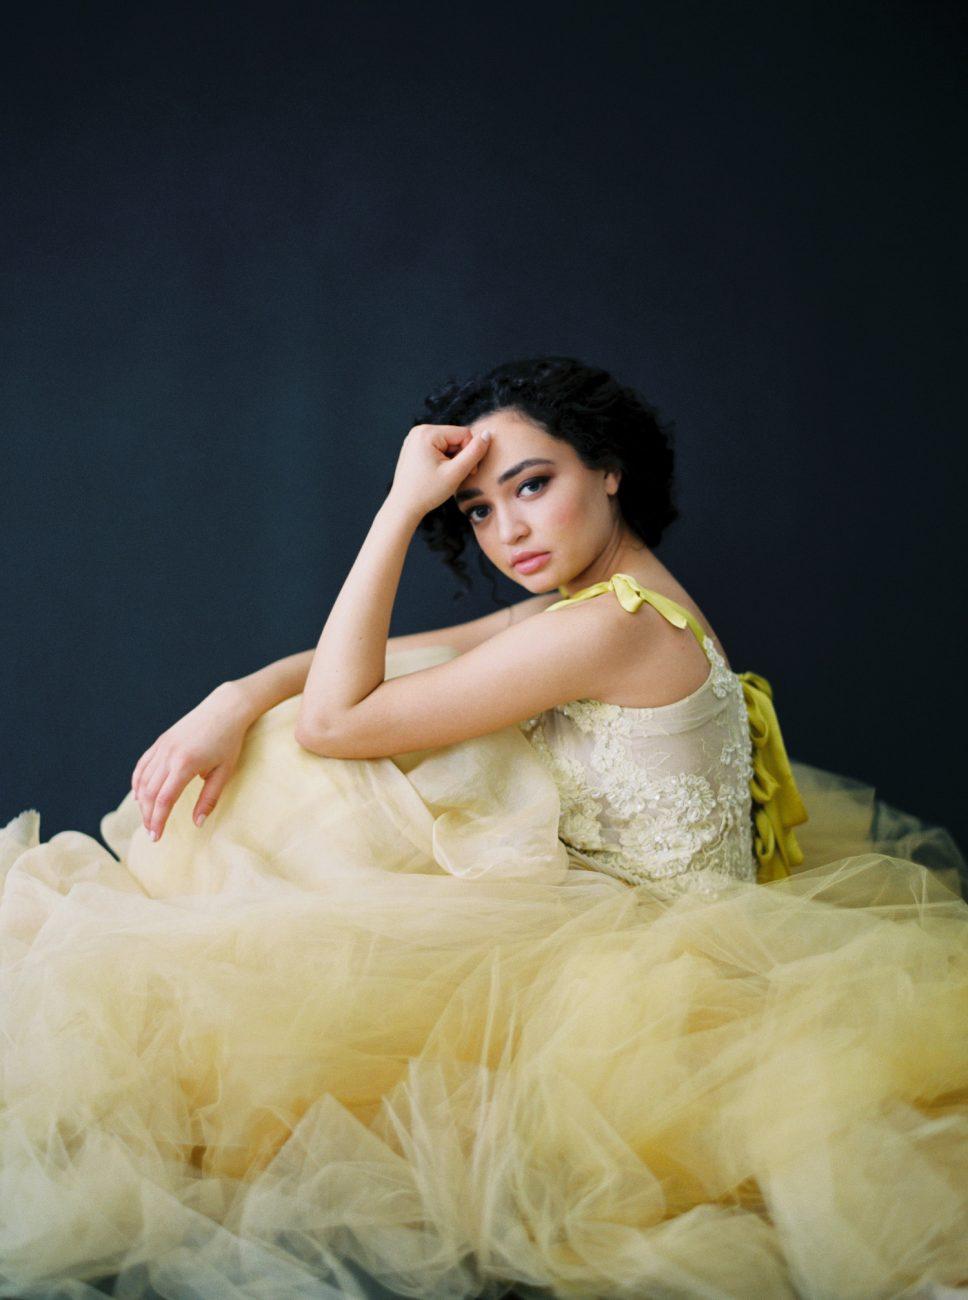 Moody Black Wedding Inspiration_yellow dress puffed up